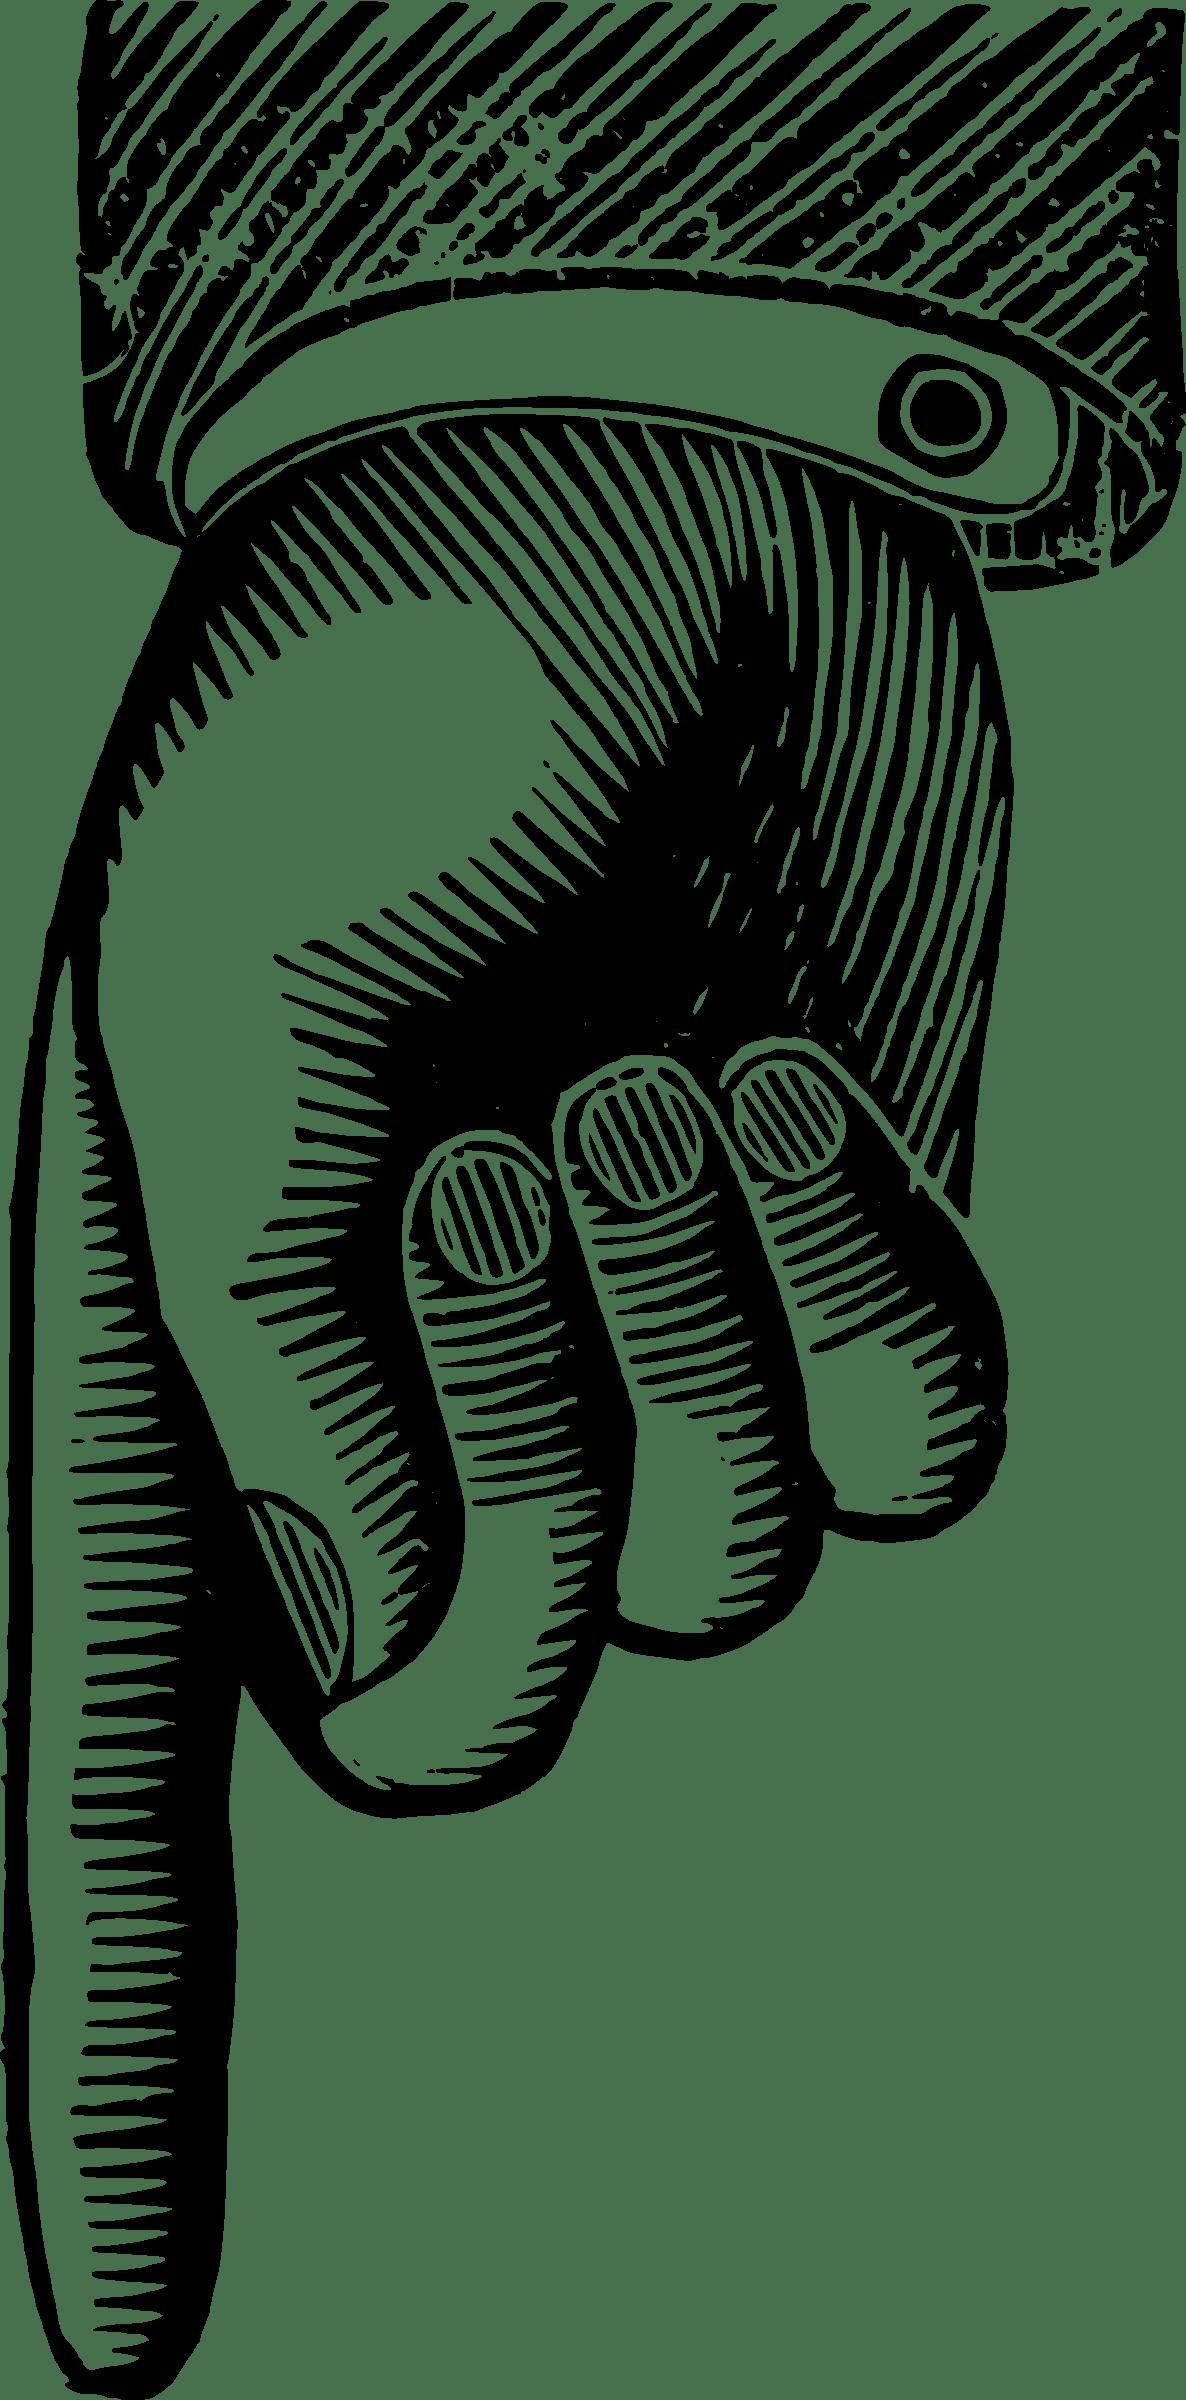 Finger Pointing Downward Vector Clipart Image